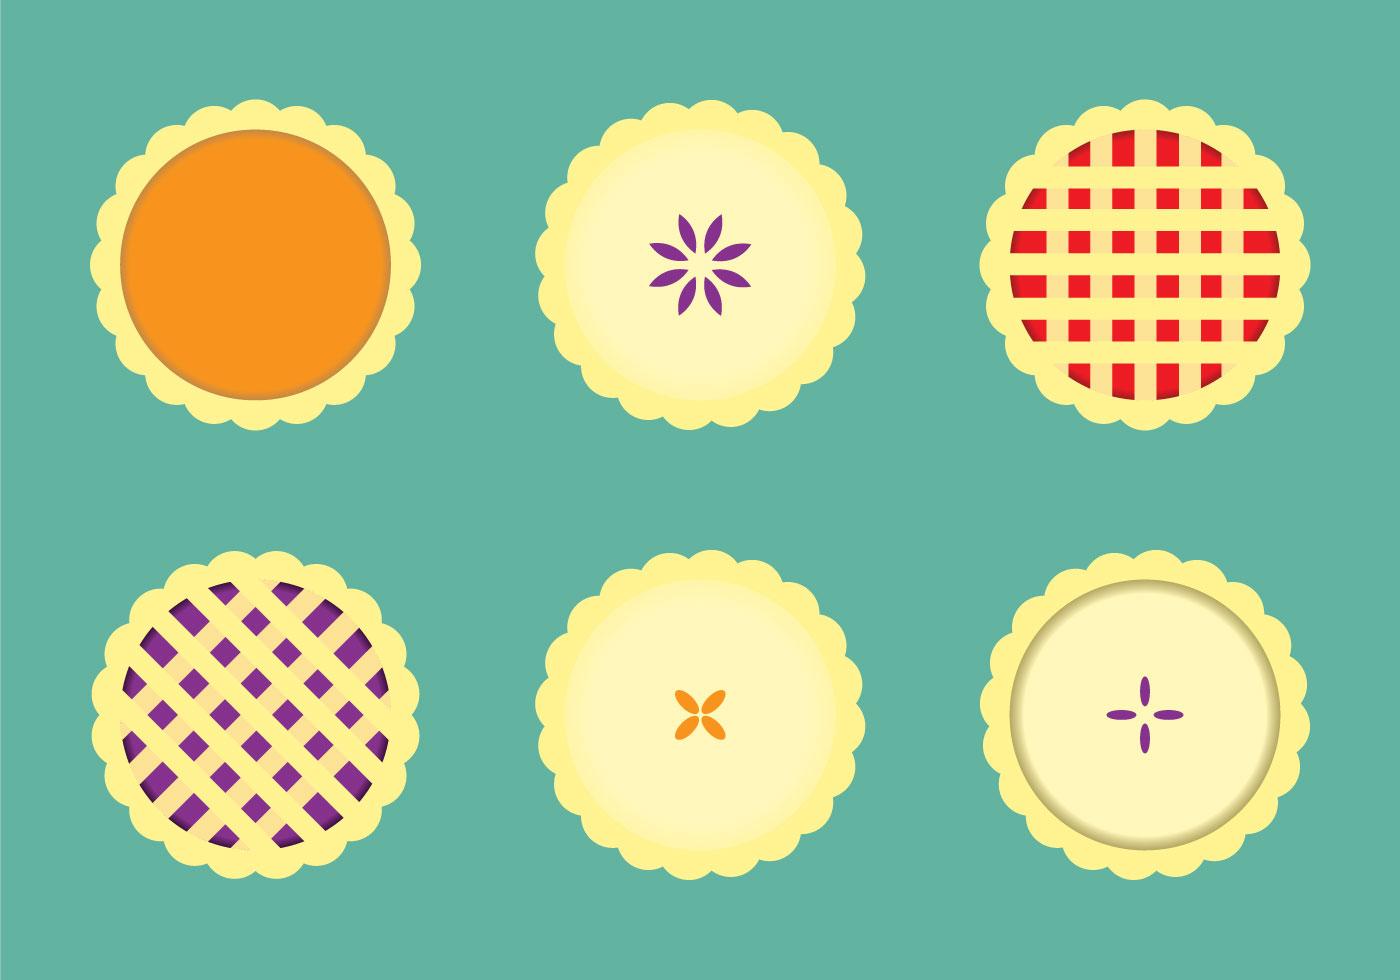 free food clipart apple pie - photo #48